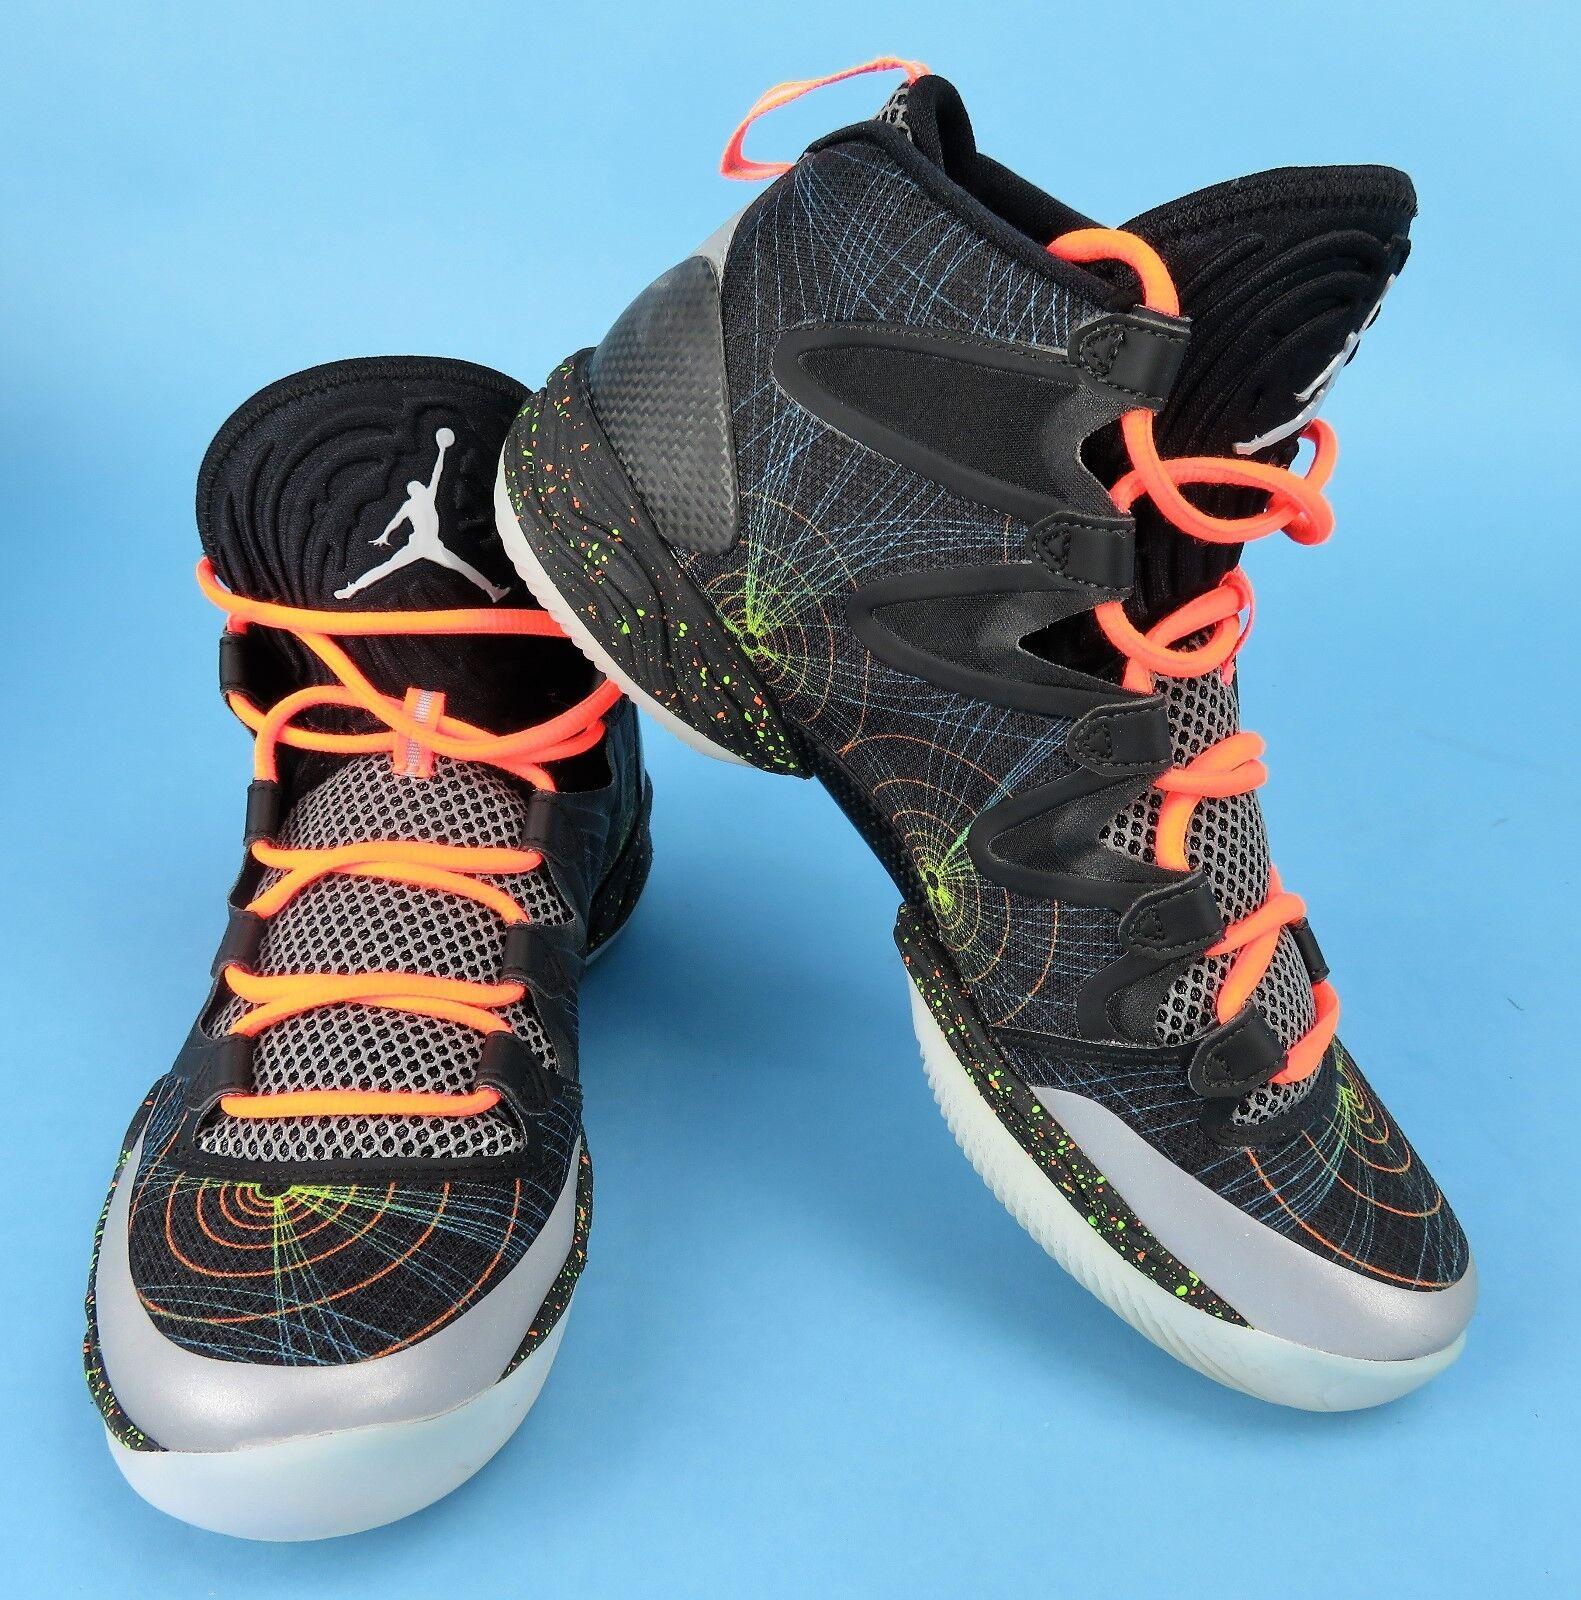 reputable site cc110 704f5 ... inexpensive nike air jordan xx8 se uk7 uk7 se 616345 025 schwarze  basketball trainer 41 orange ...